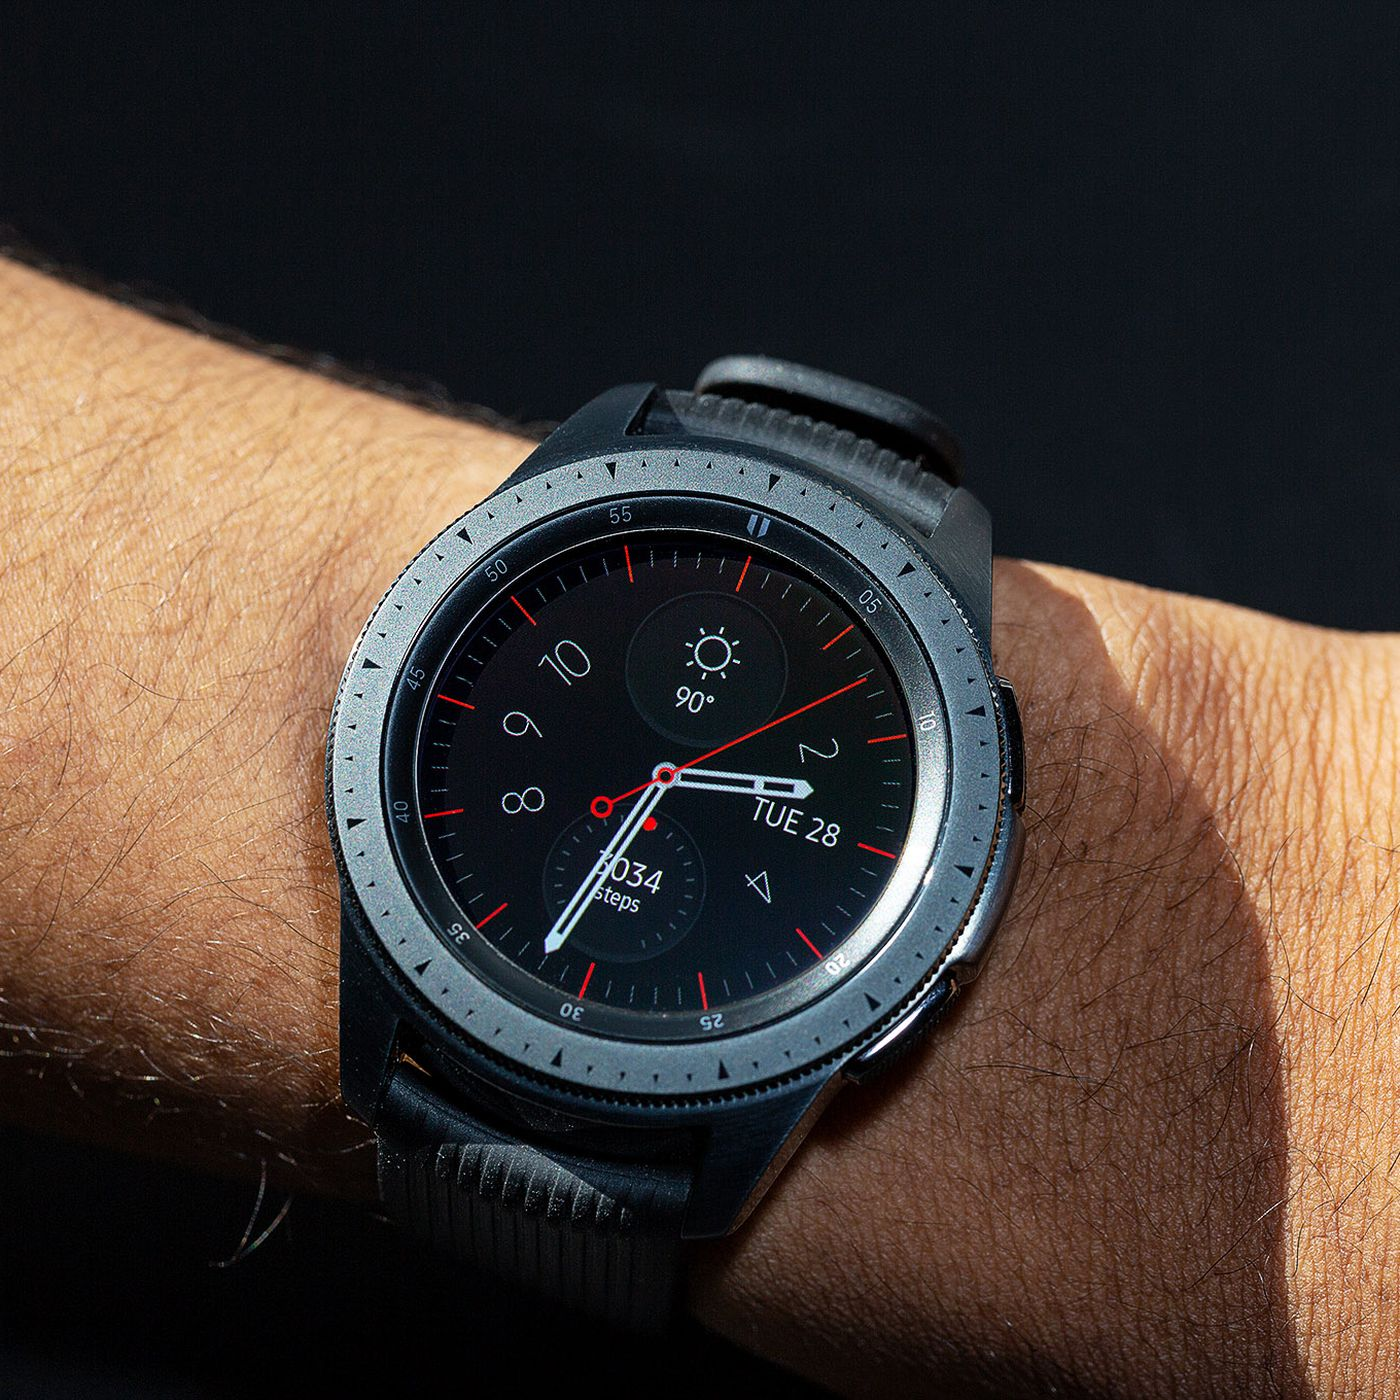 Samsung's Galaxy Watch 3 leaks again - The Verge